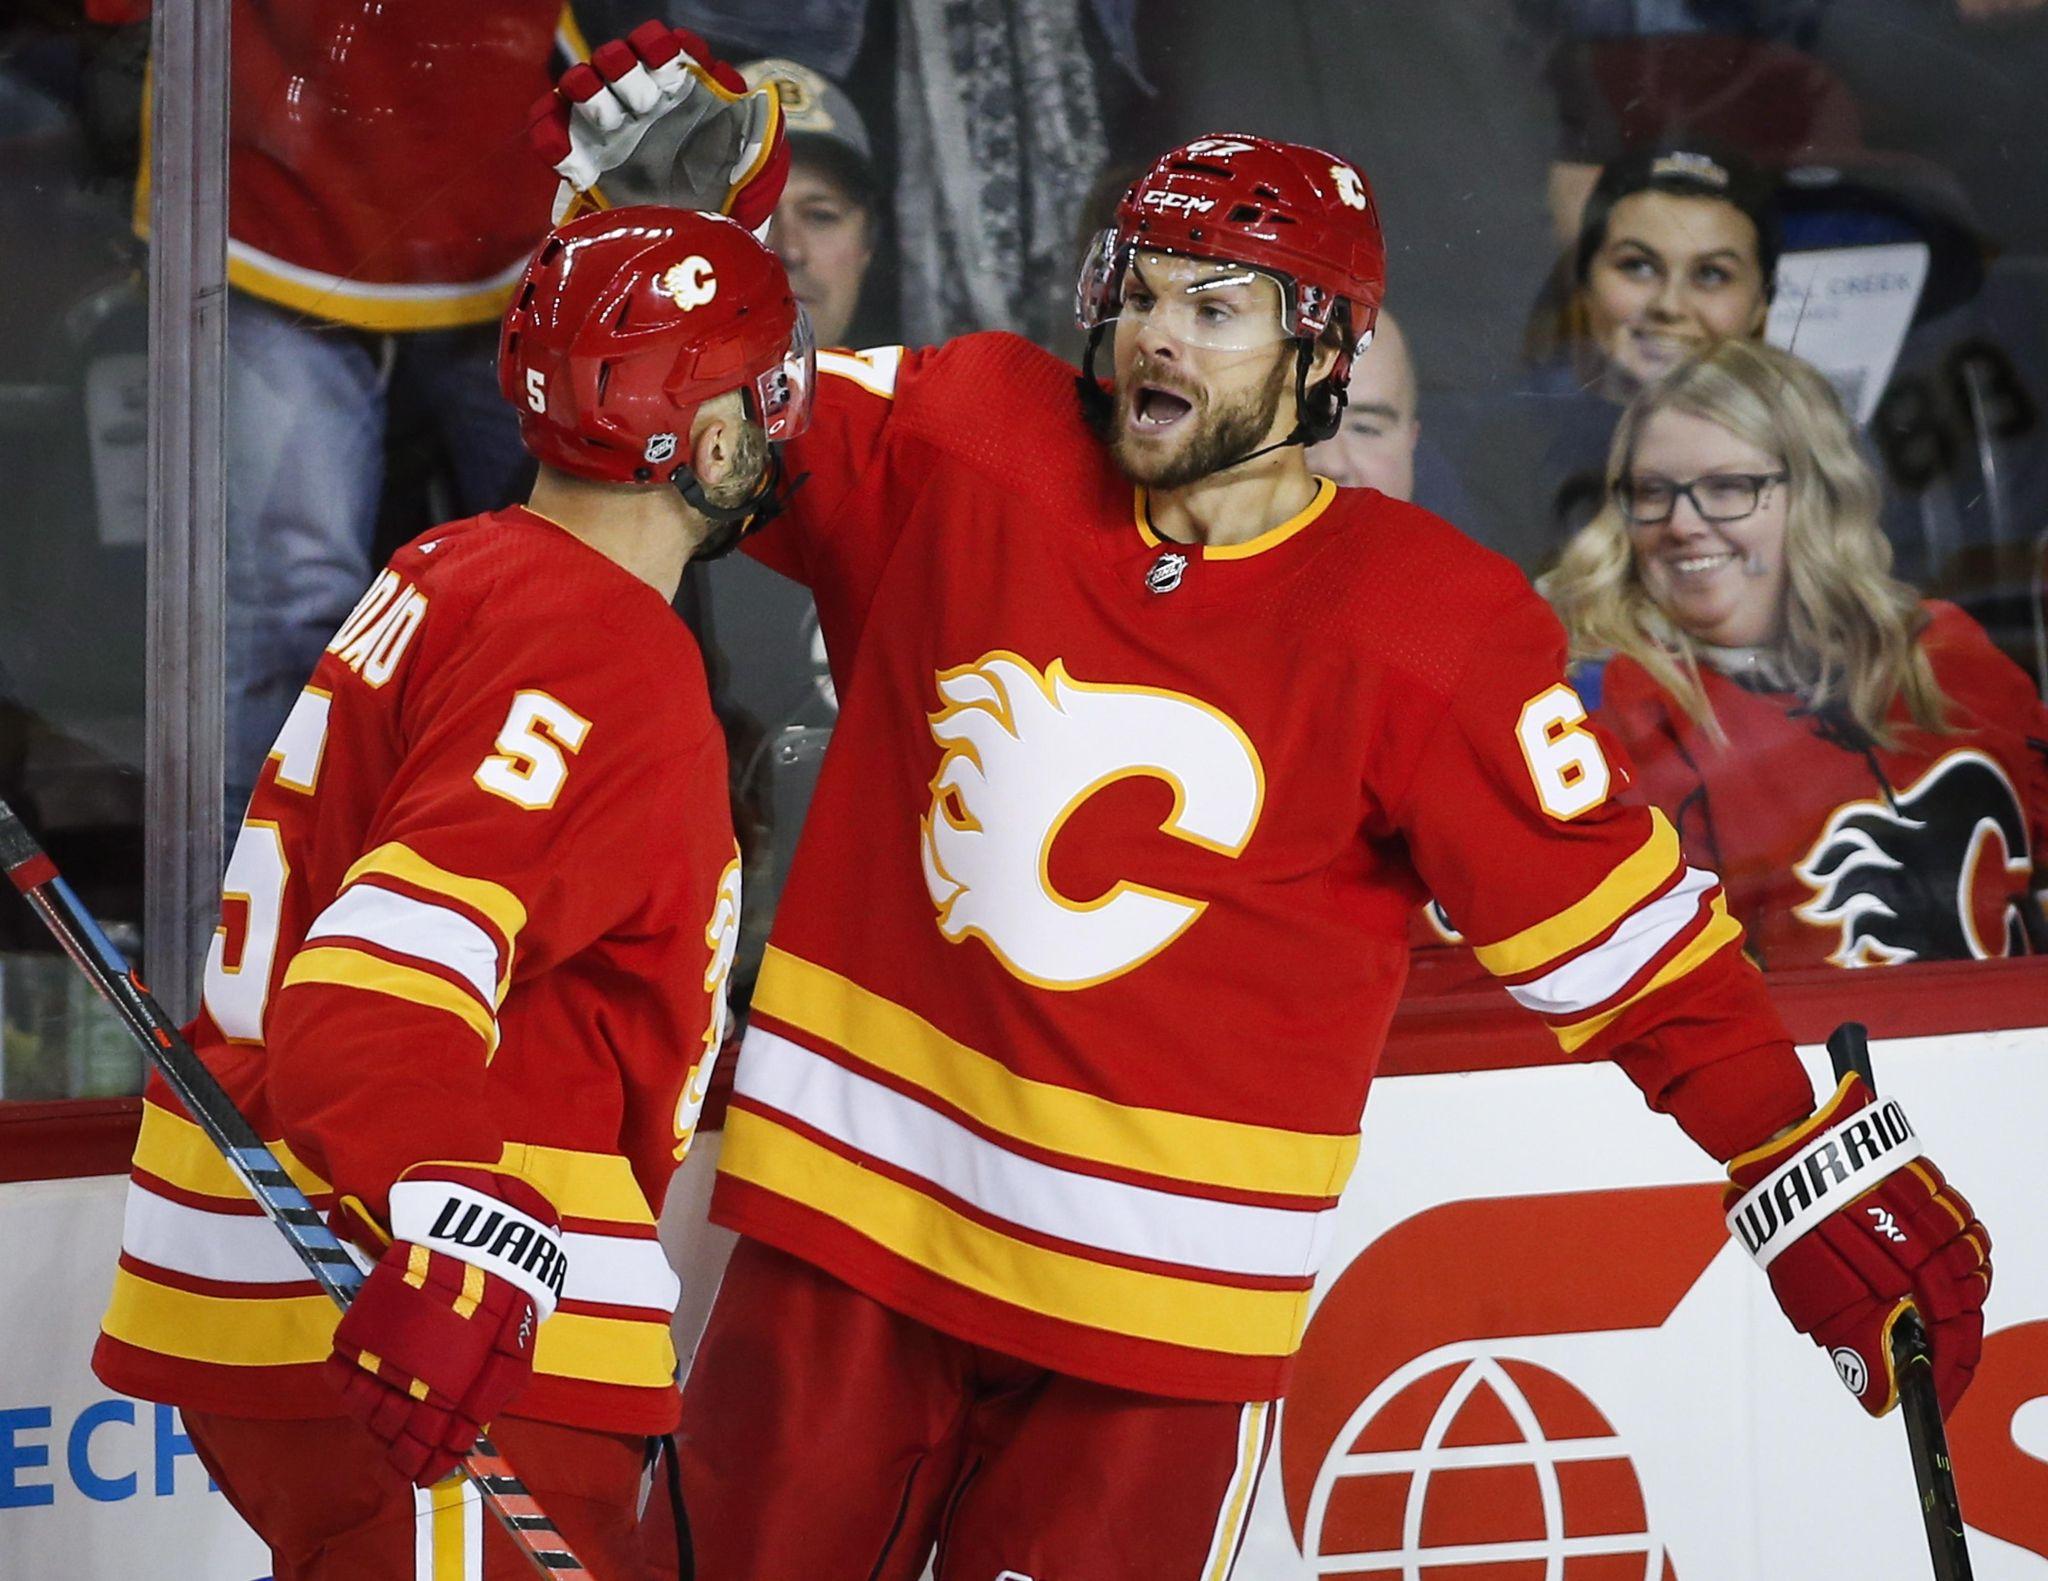 Bruins_flames_hockey_50442_s2048x1581